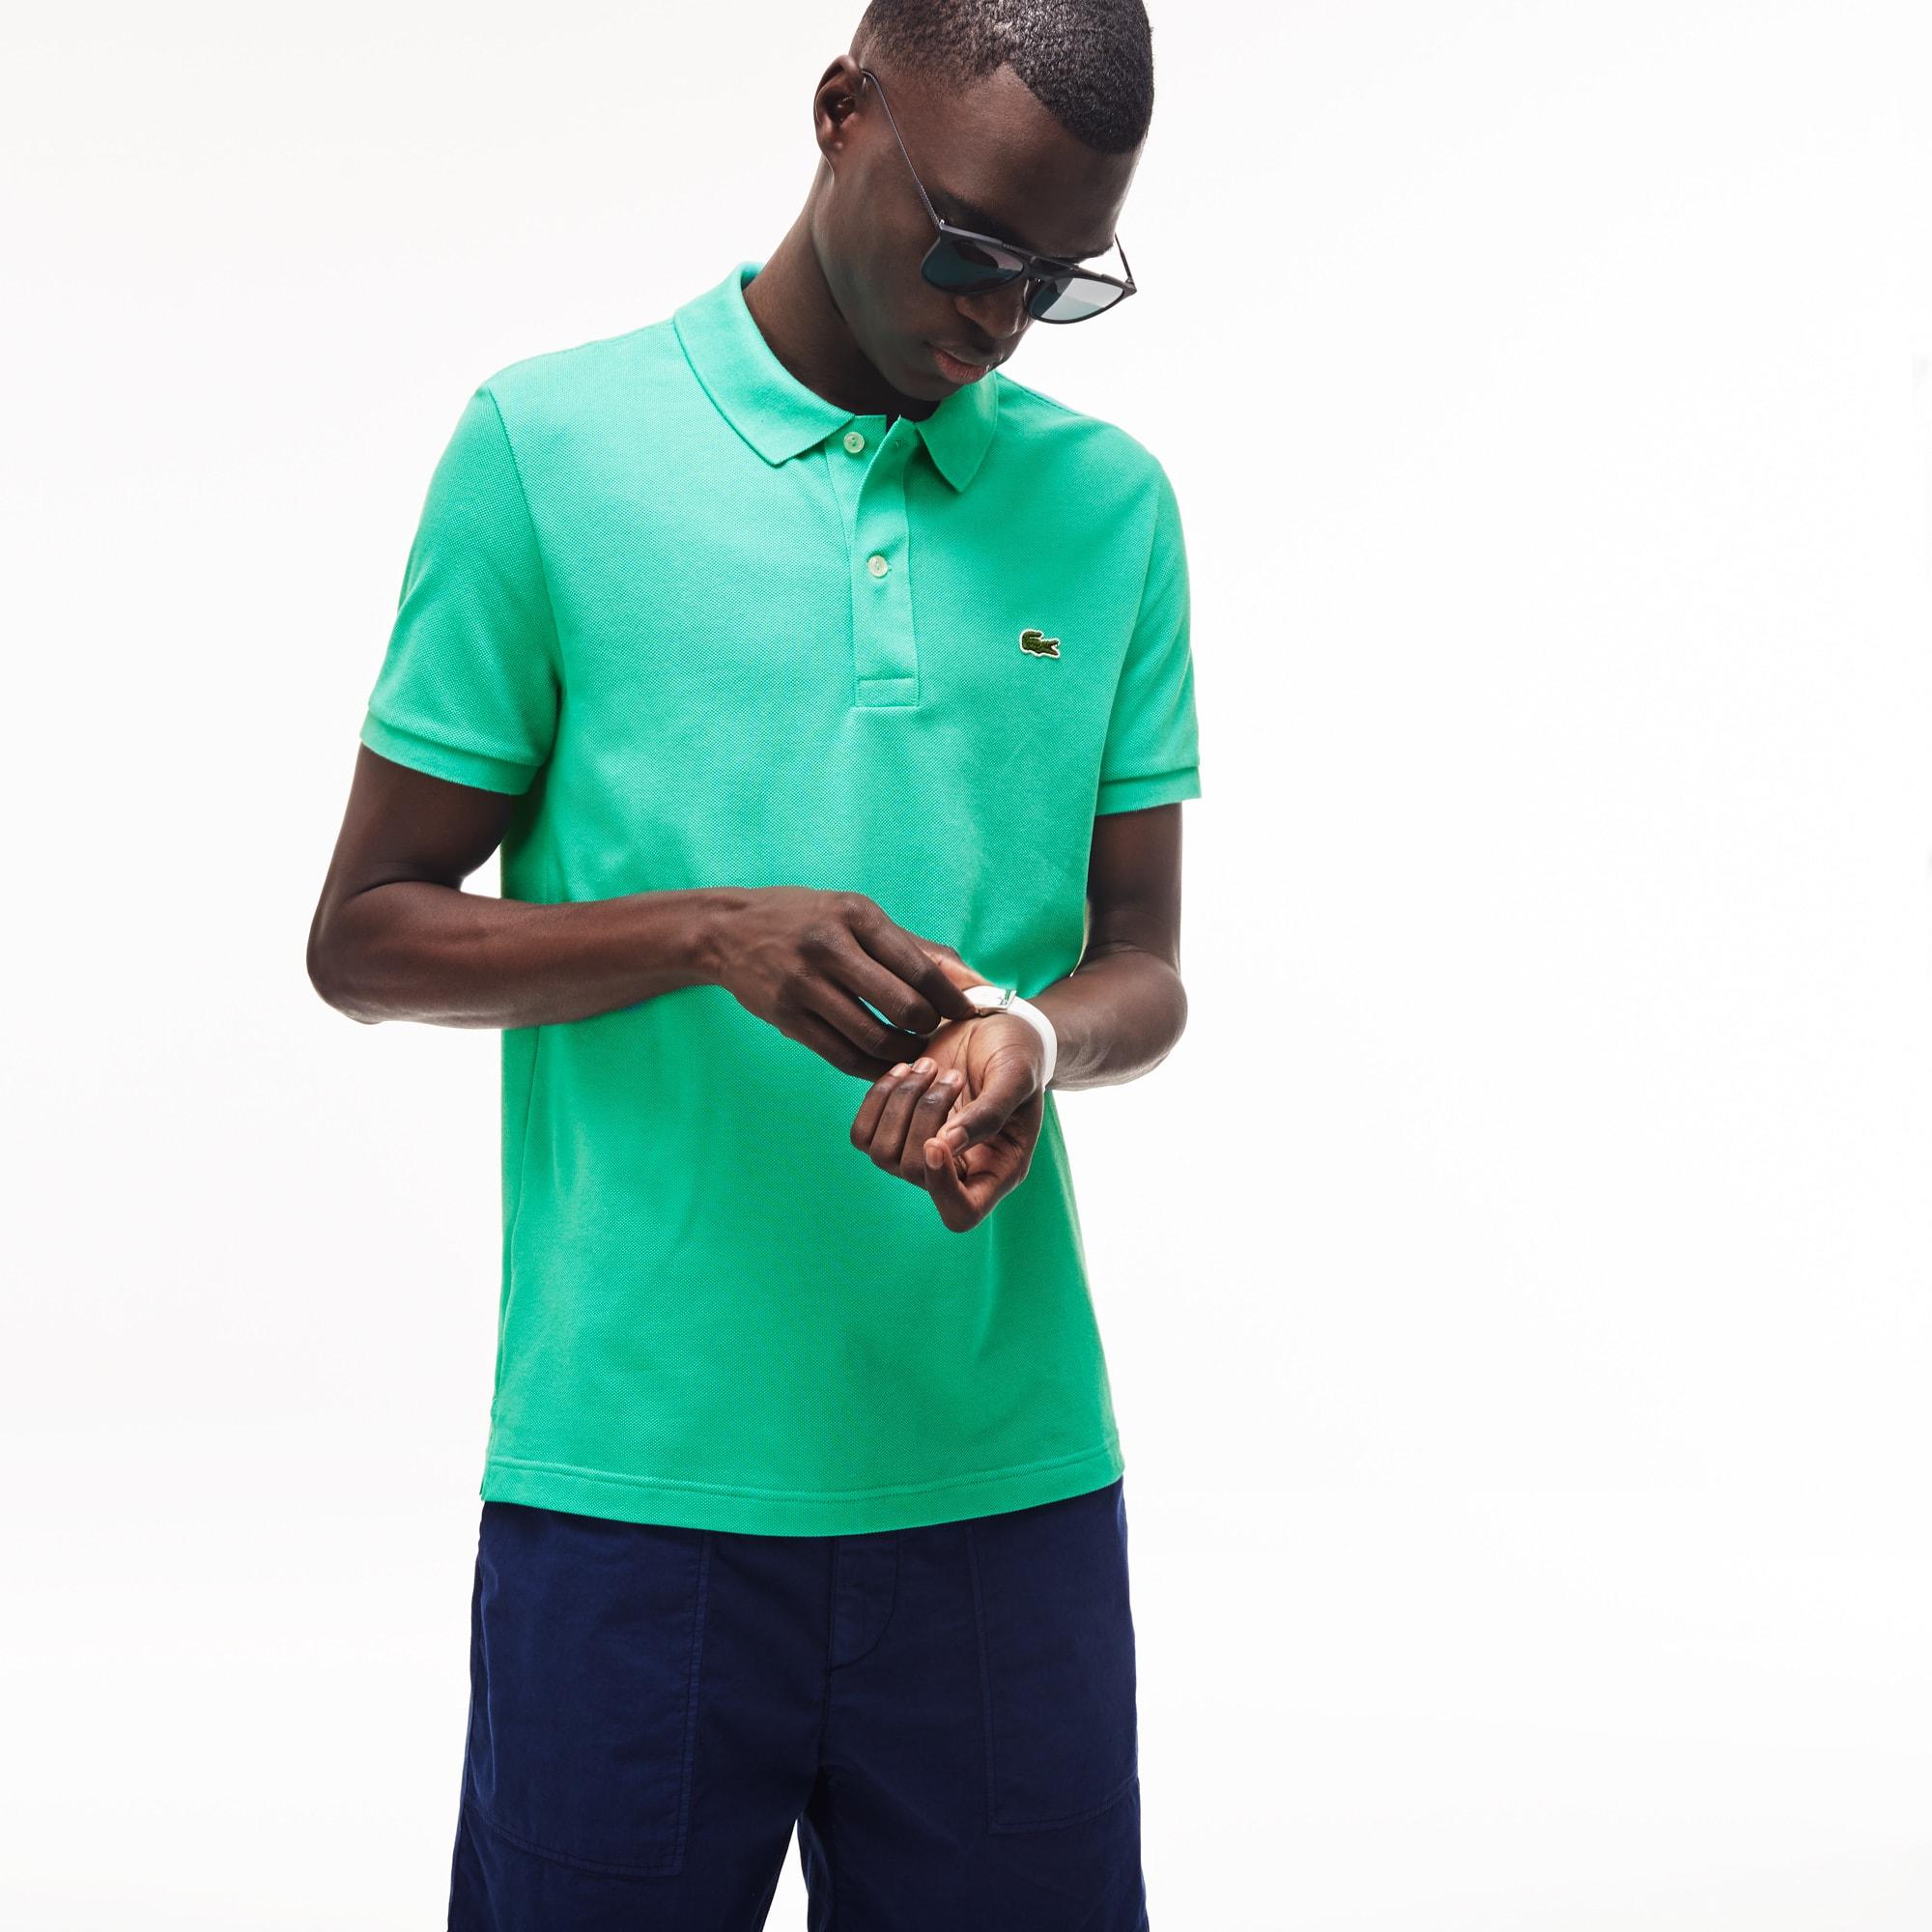 1a17d8bf86 Men's Petit Piqué Slim Fit Polo Shirt in Light Green